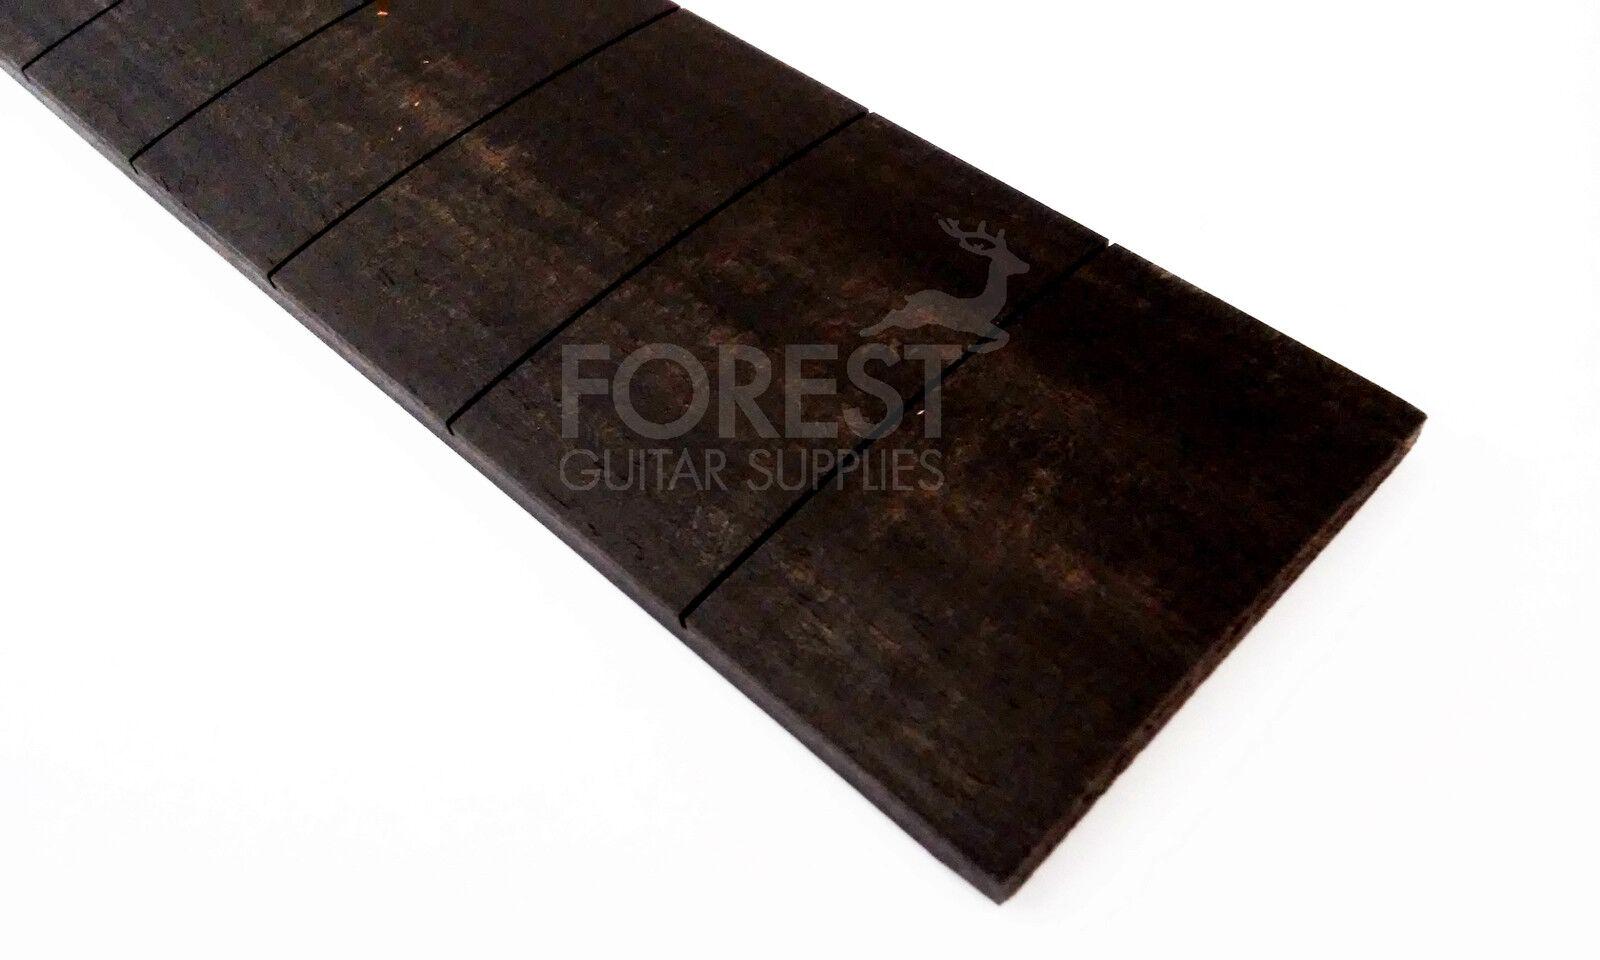 Ebony Guitar Fretboard, Fingerboard 25   Prs Slotted, Compound Radius 10-16